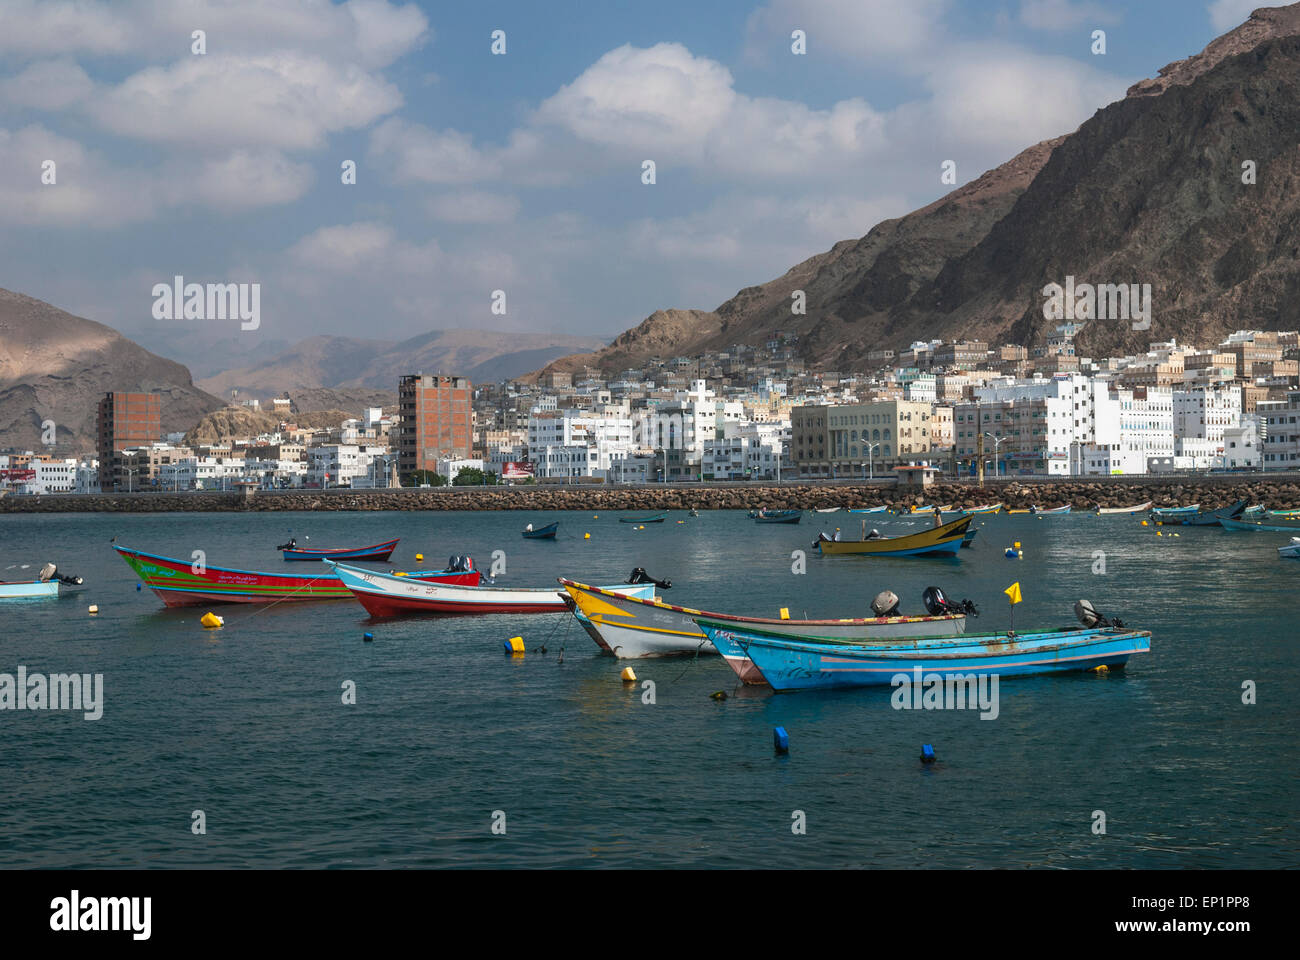 The fishing port of Al Mukalla in Yemen - Stock Image